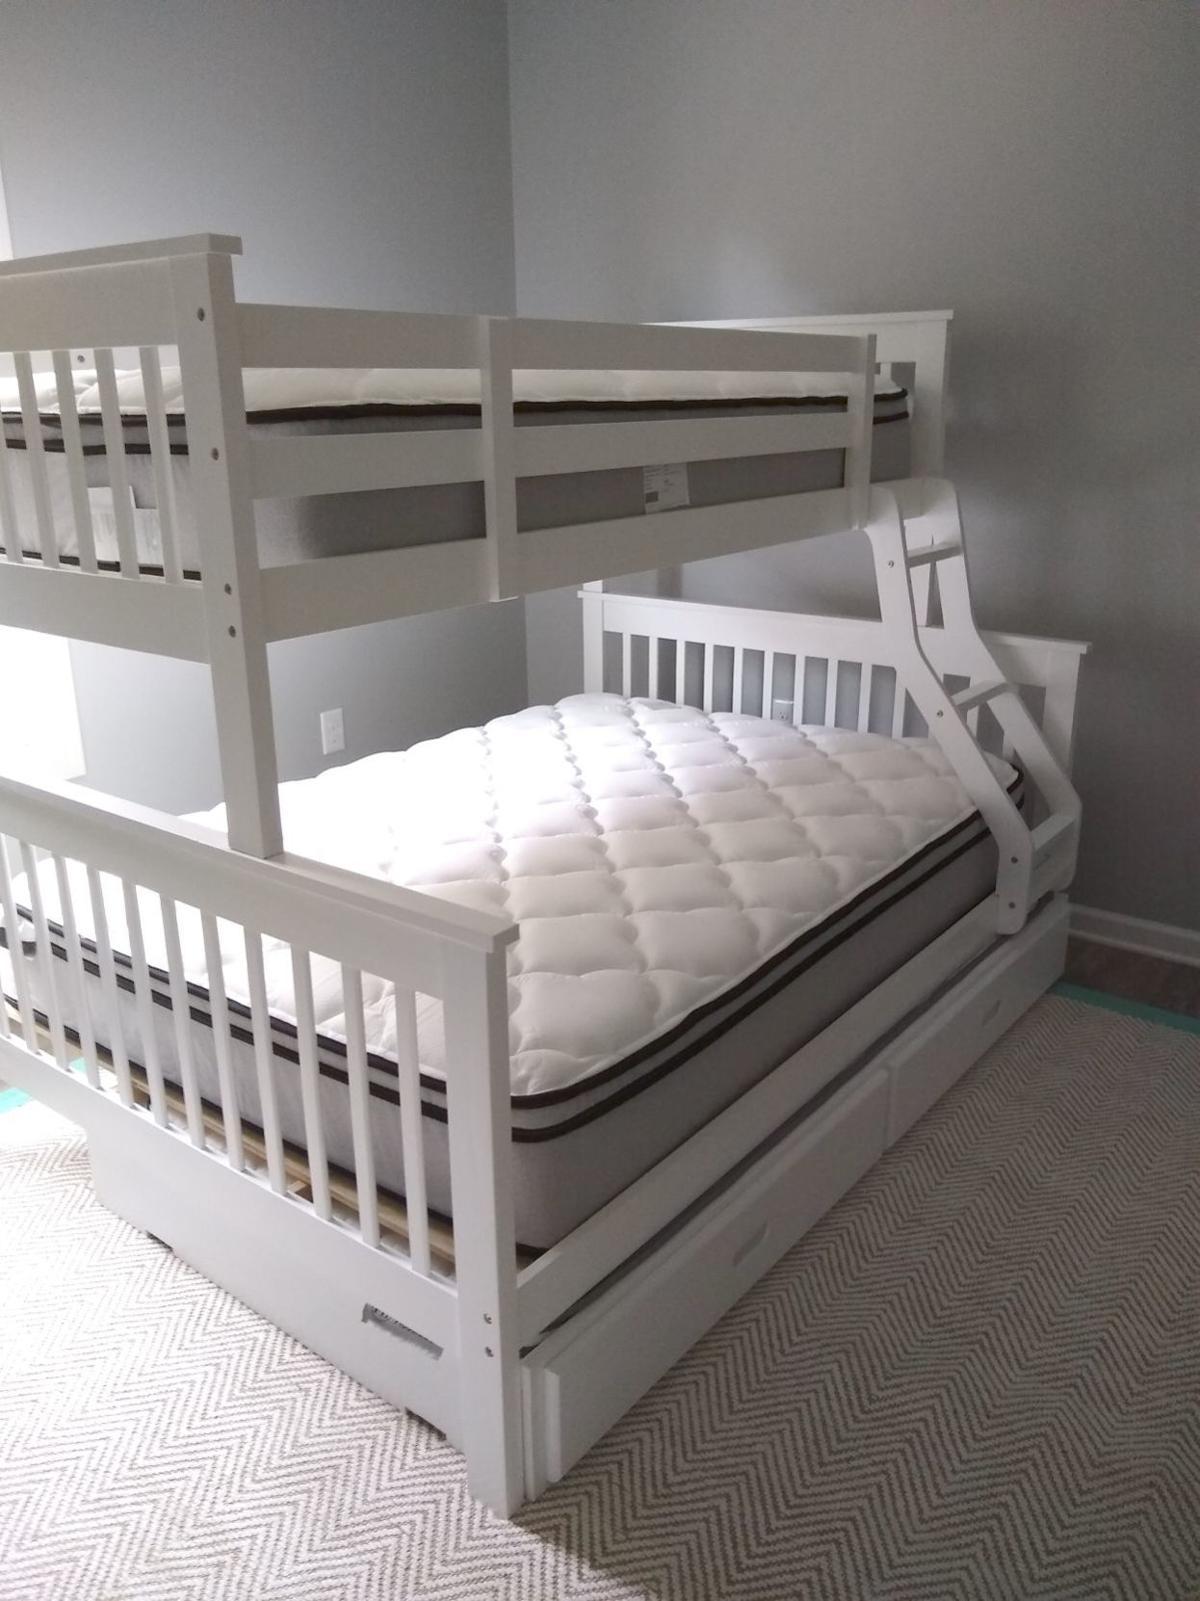 Isaiah House bedroom